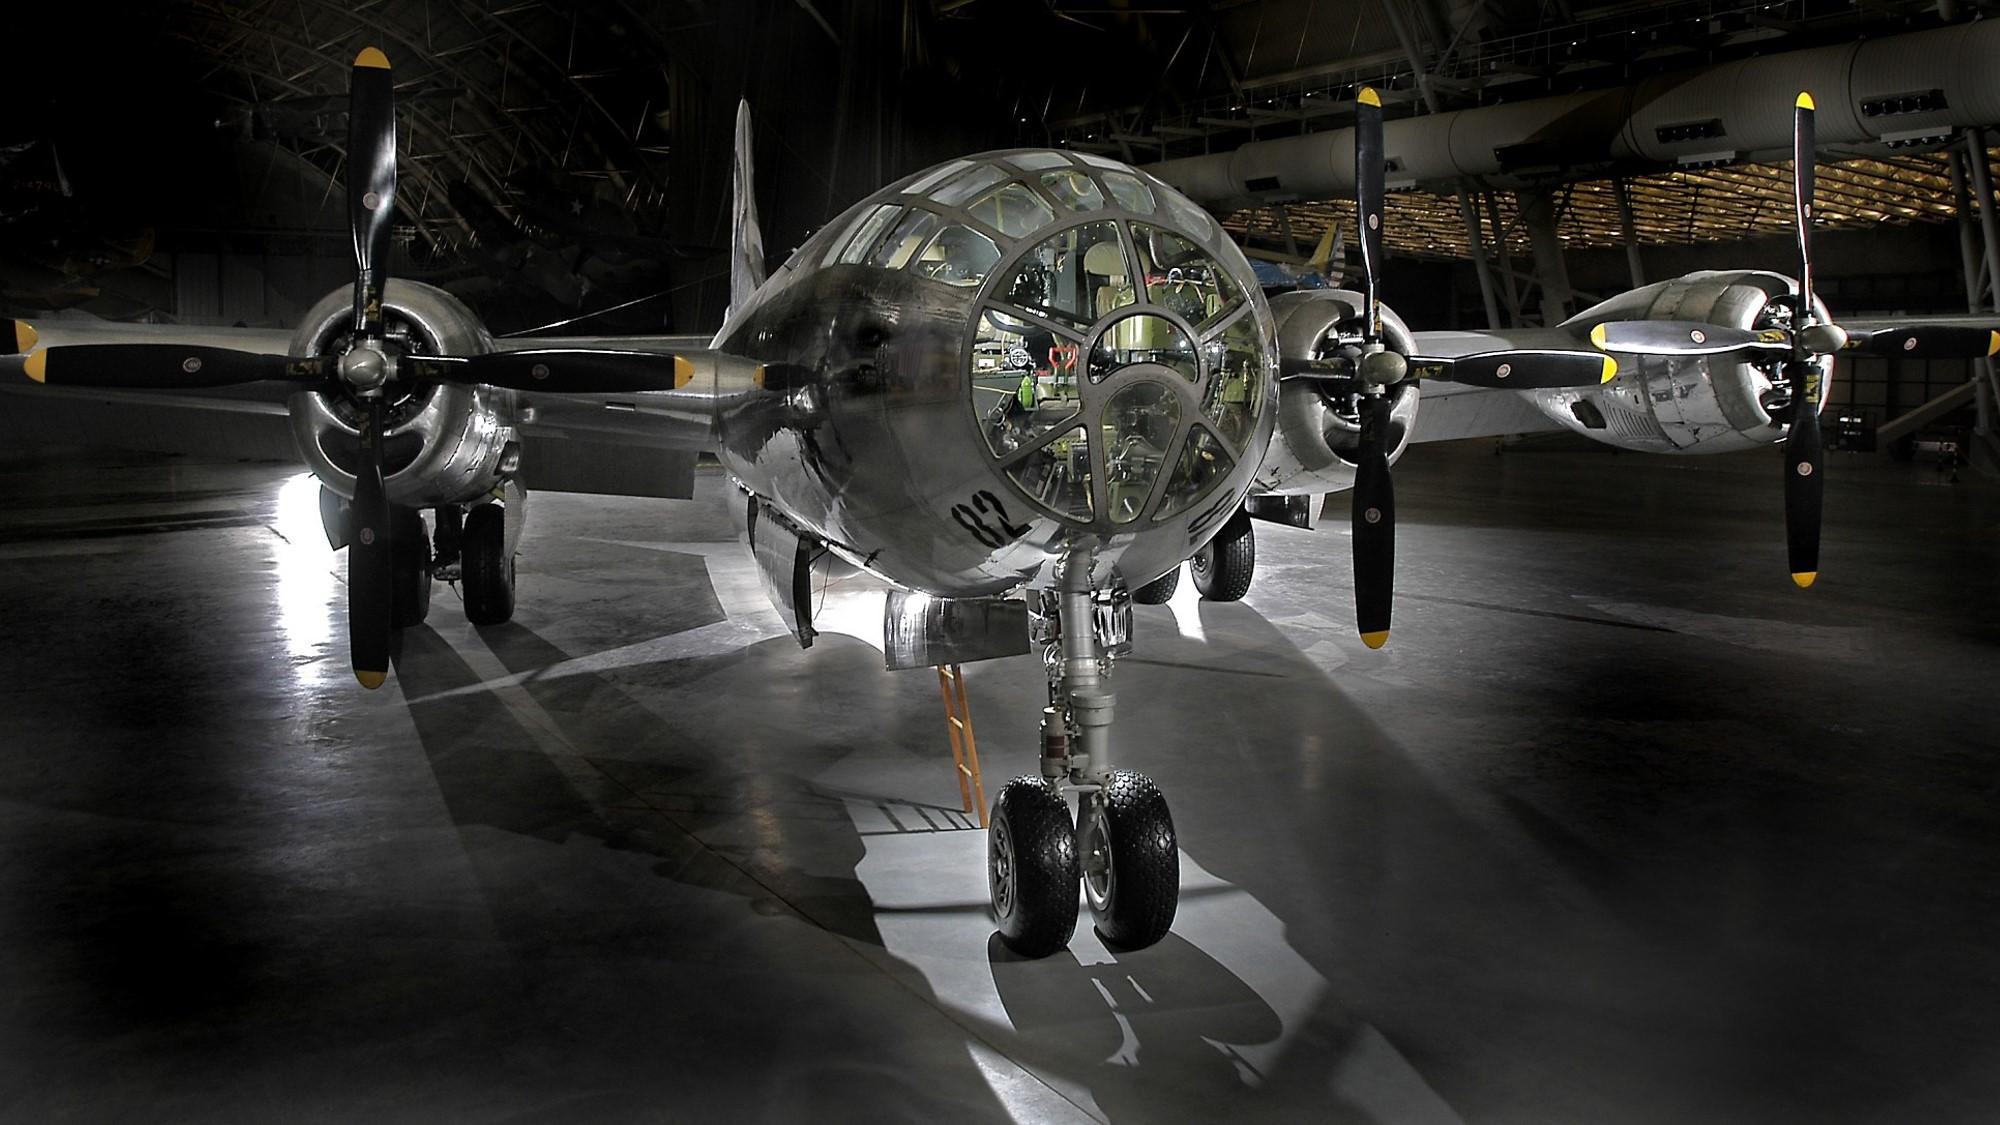 Smithsonian - B-29 Enola Gay